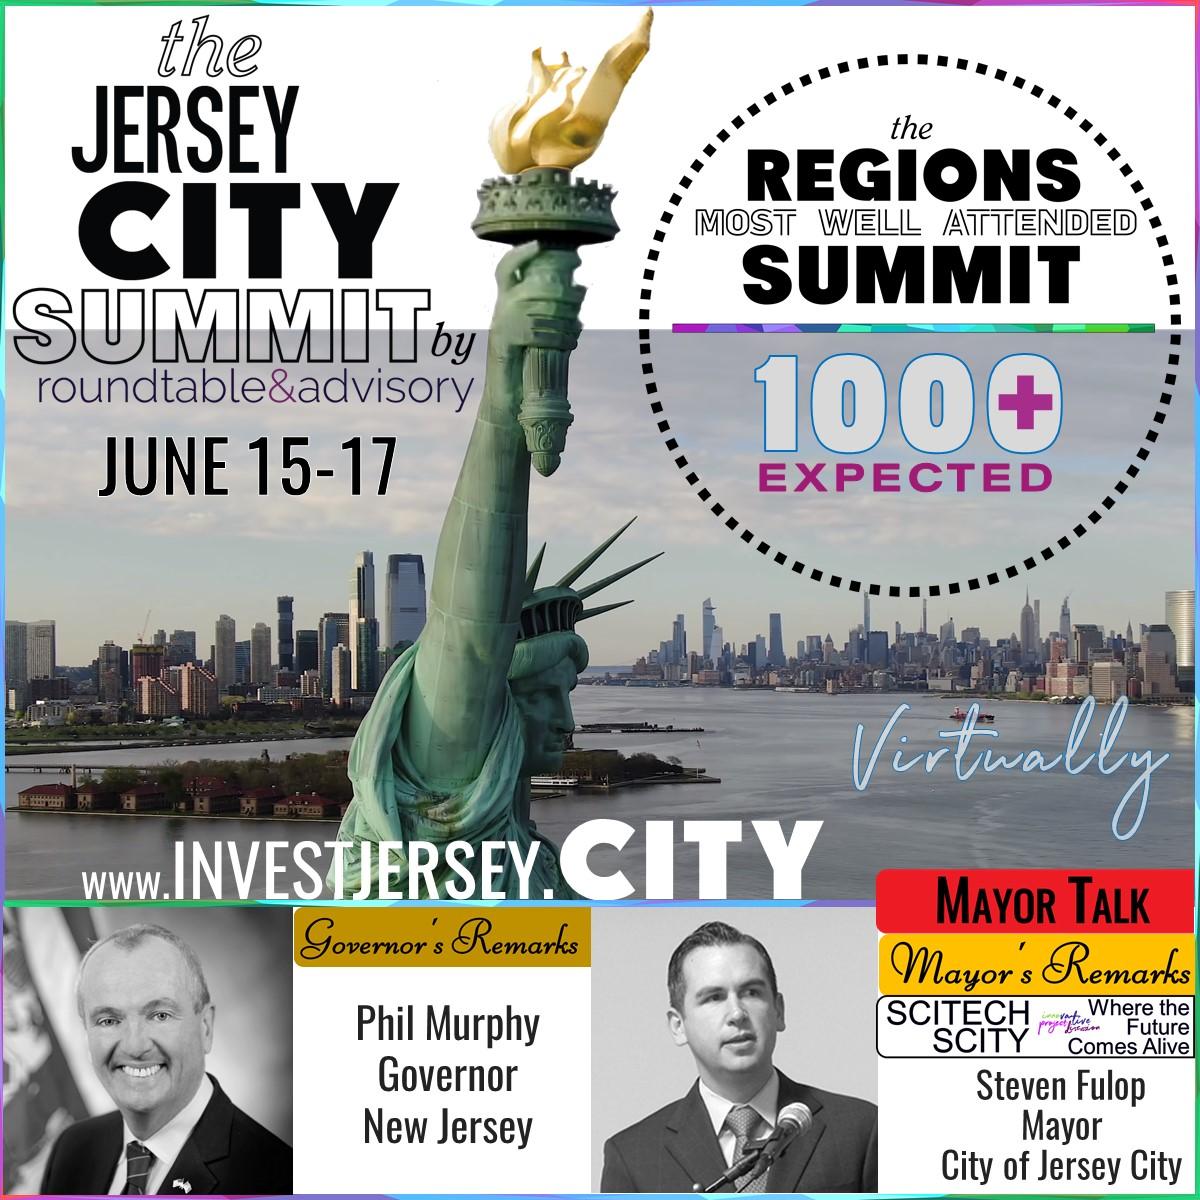 Murphy, Fulop @ 2021, The Jersey City Summit